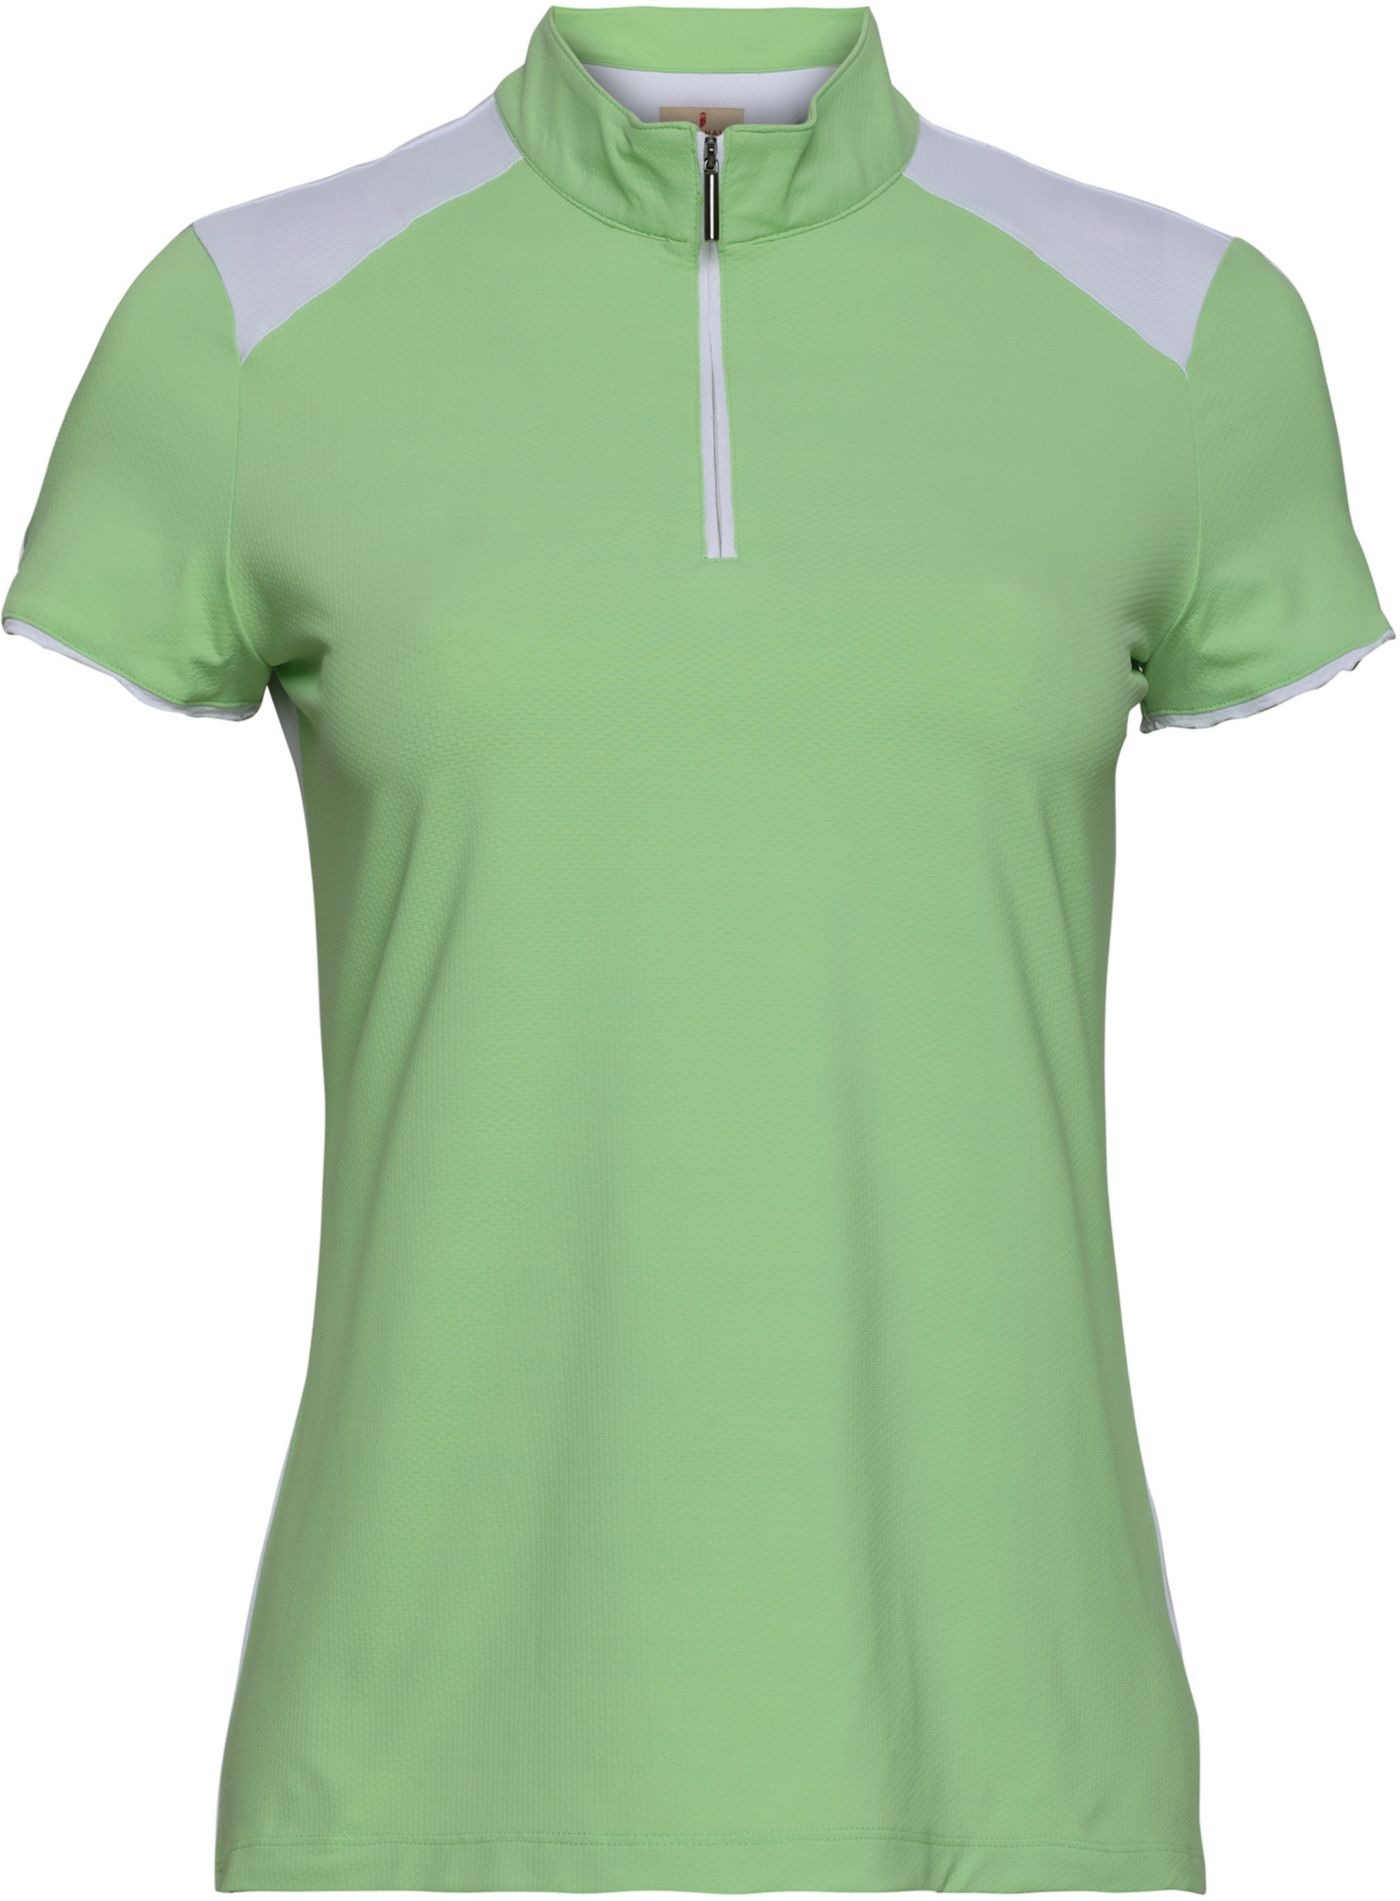 Sport Haley Women's Kristy Colorblock Short Sleeve Golf Polo